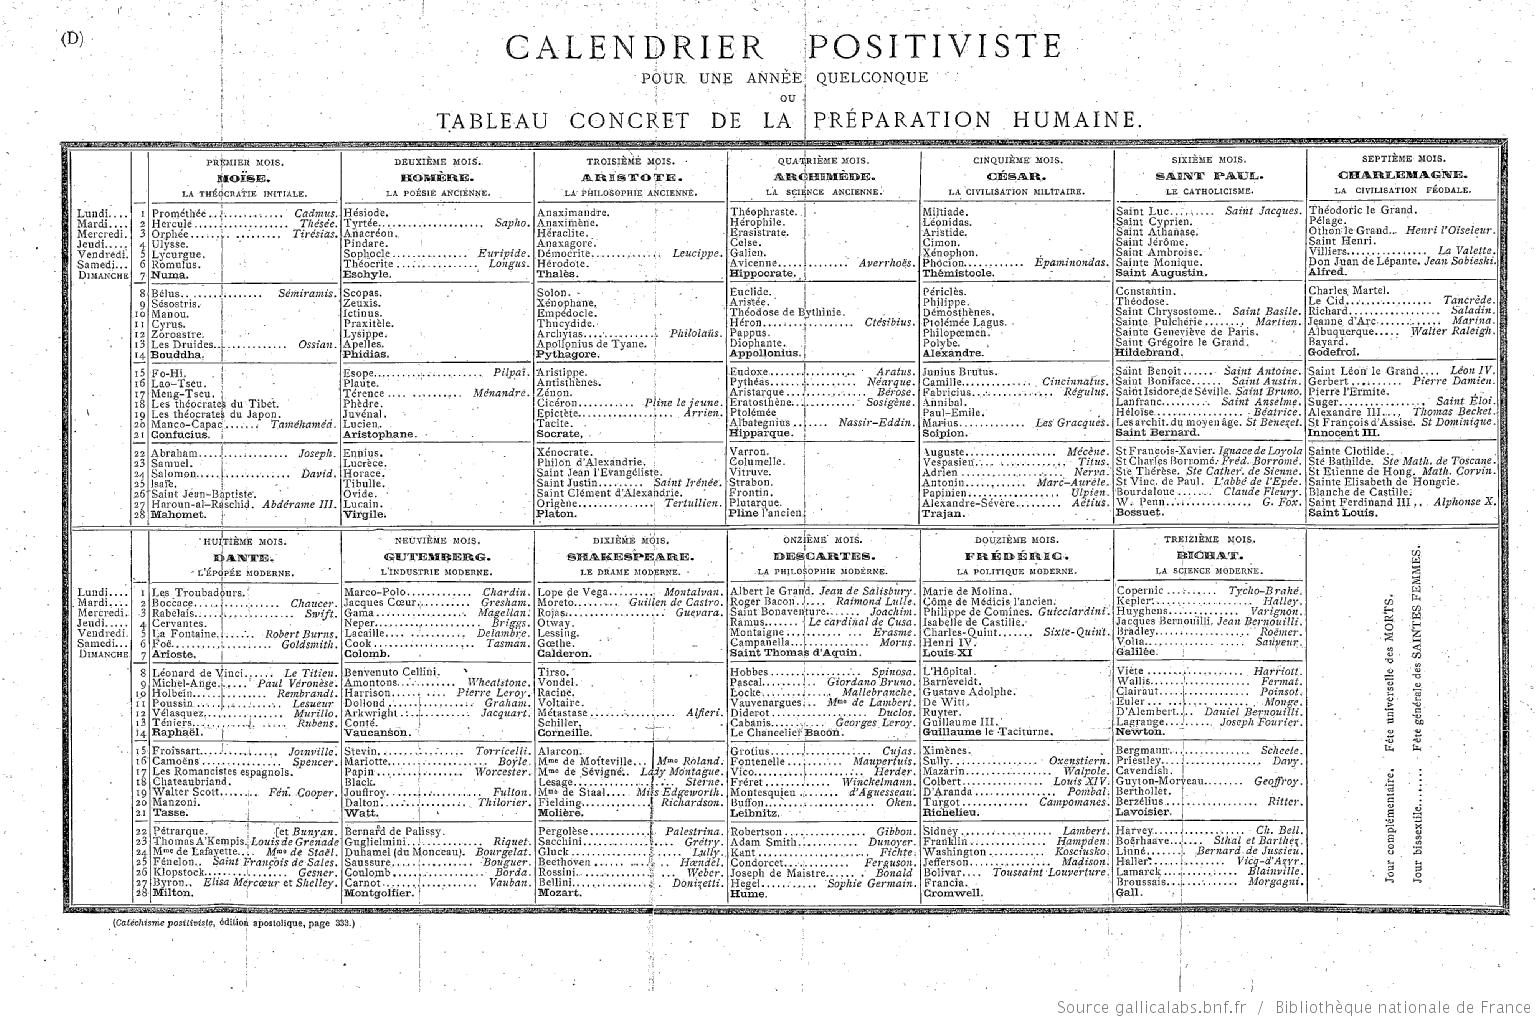 Calendrier Positiviste, from Comte, Catechisme, ed. 1891, p.333